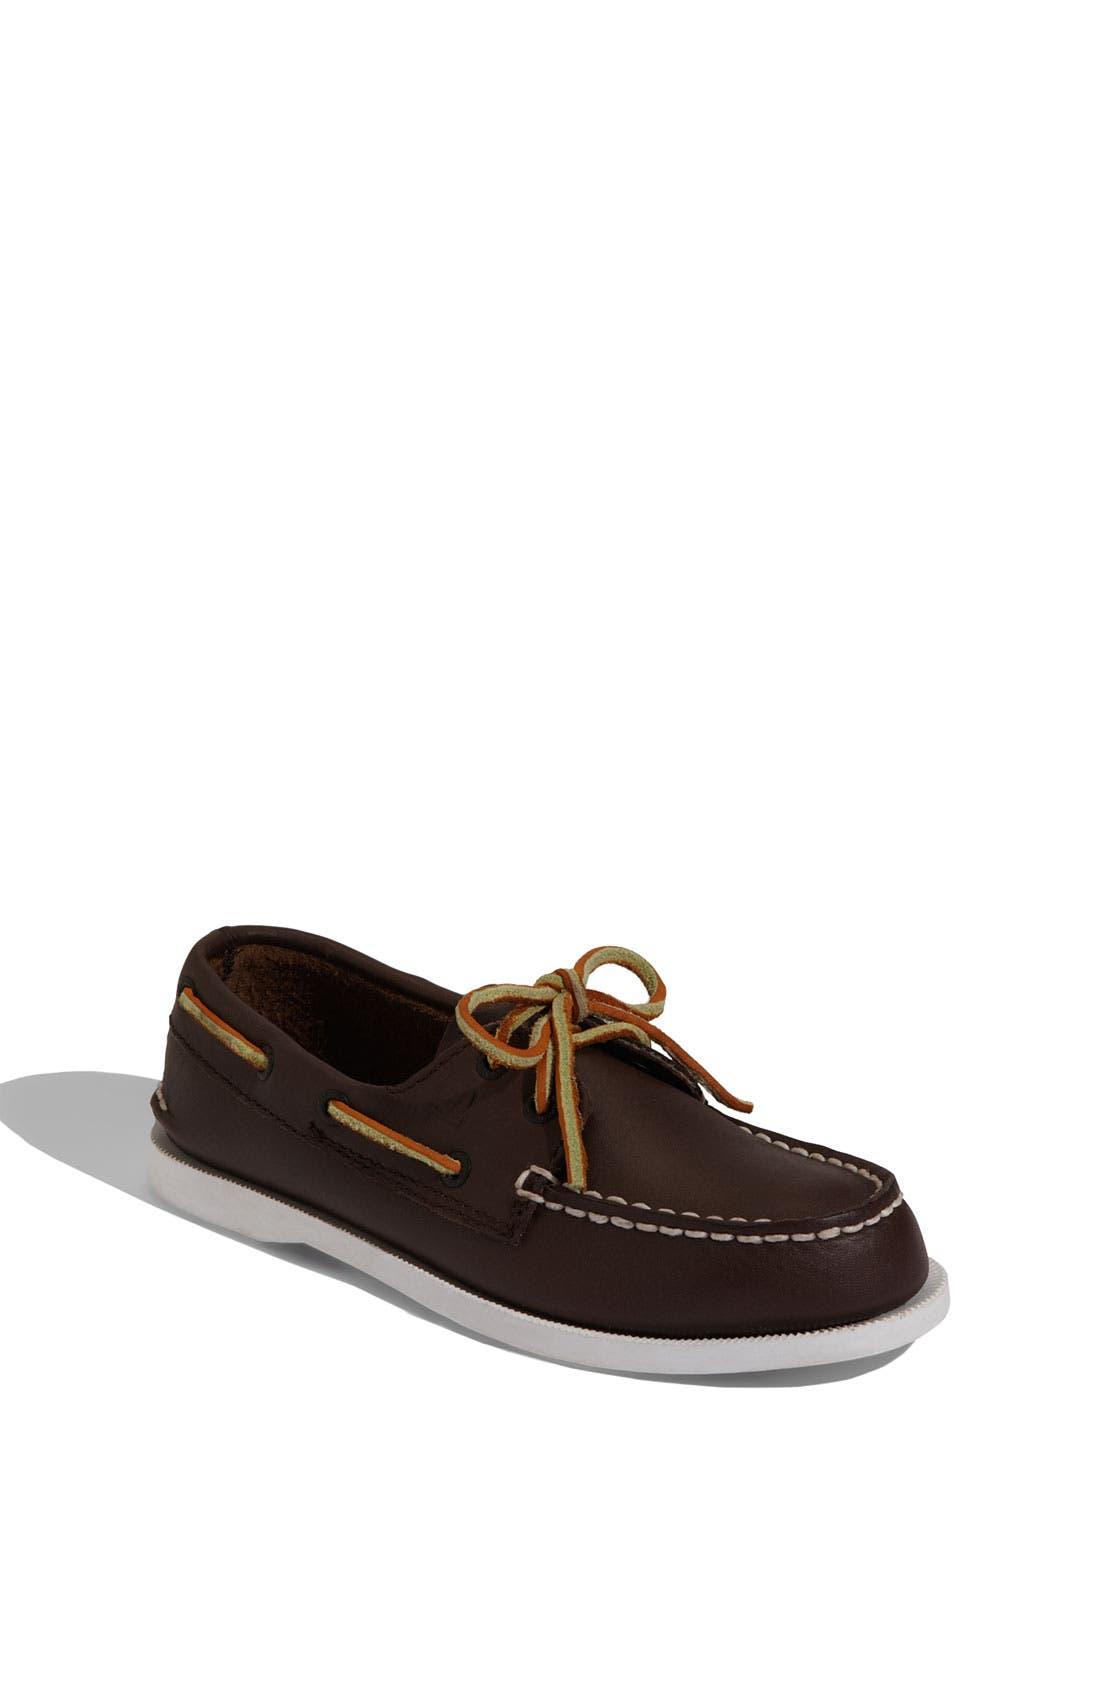 Sperry Kids Authentic Original Boat Shoe Walker